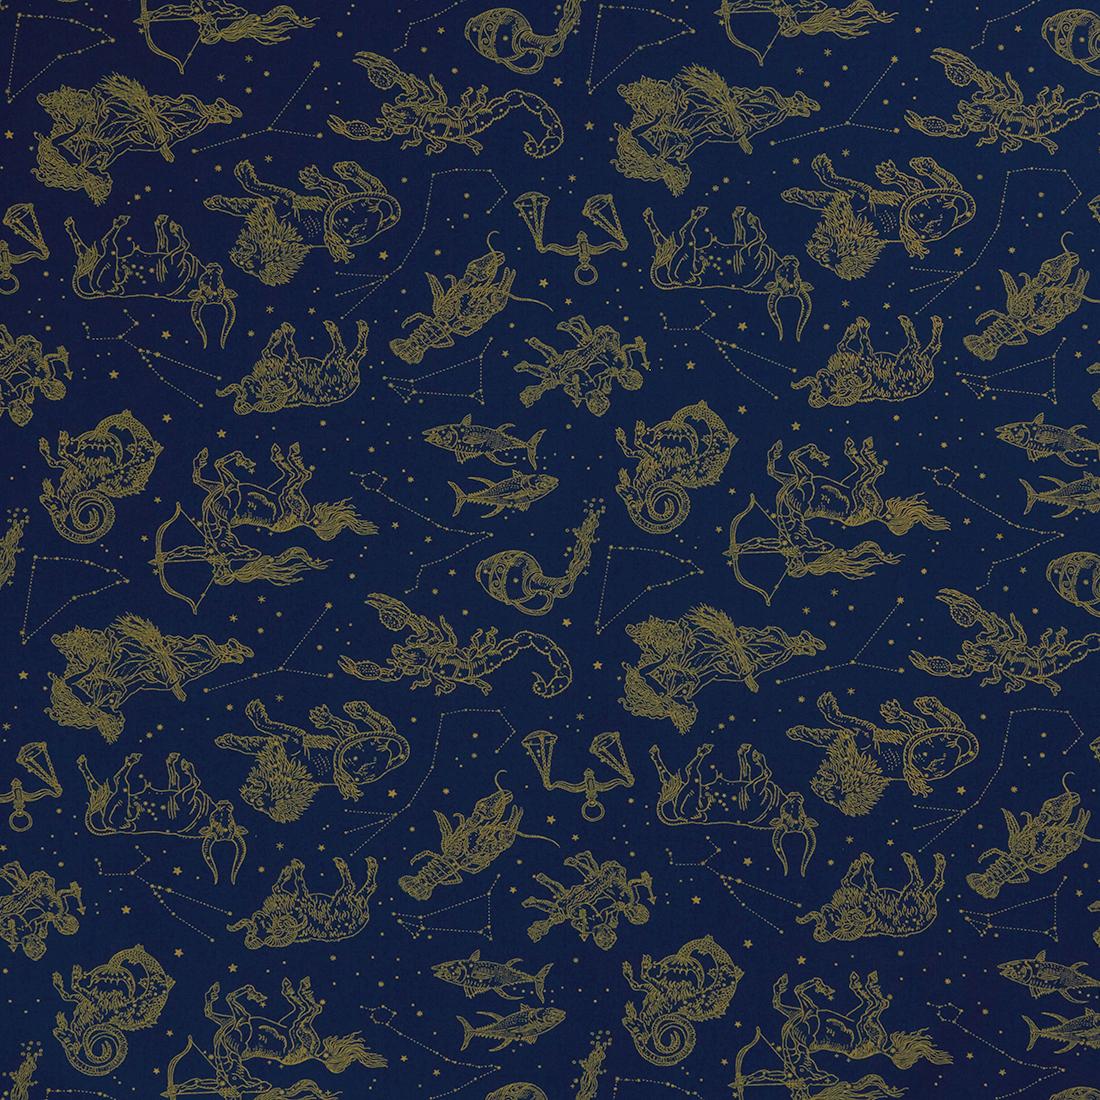 Astrology Navy Dress Fabric